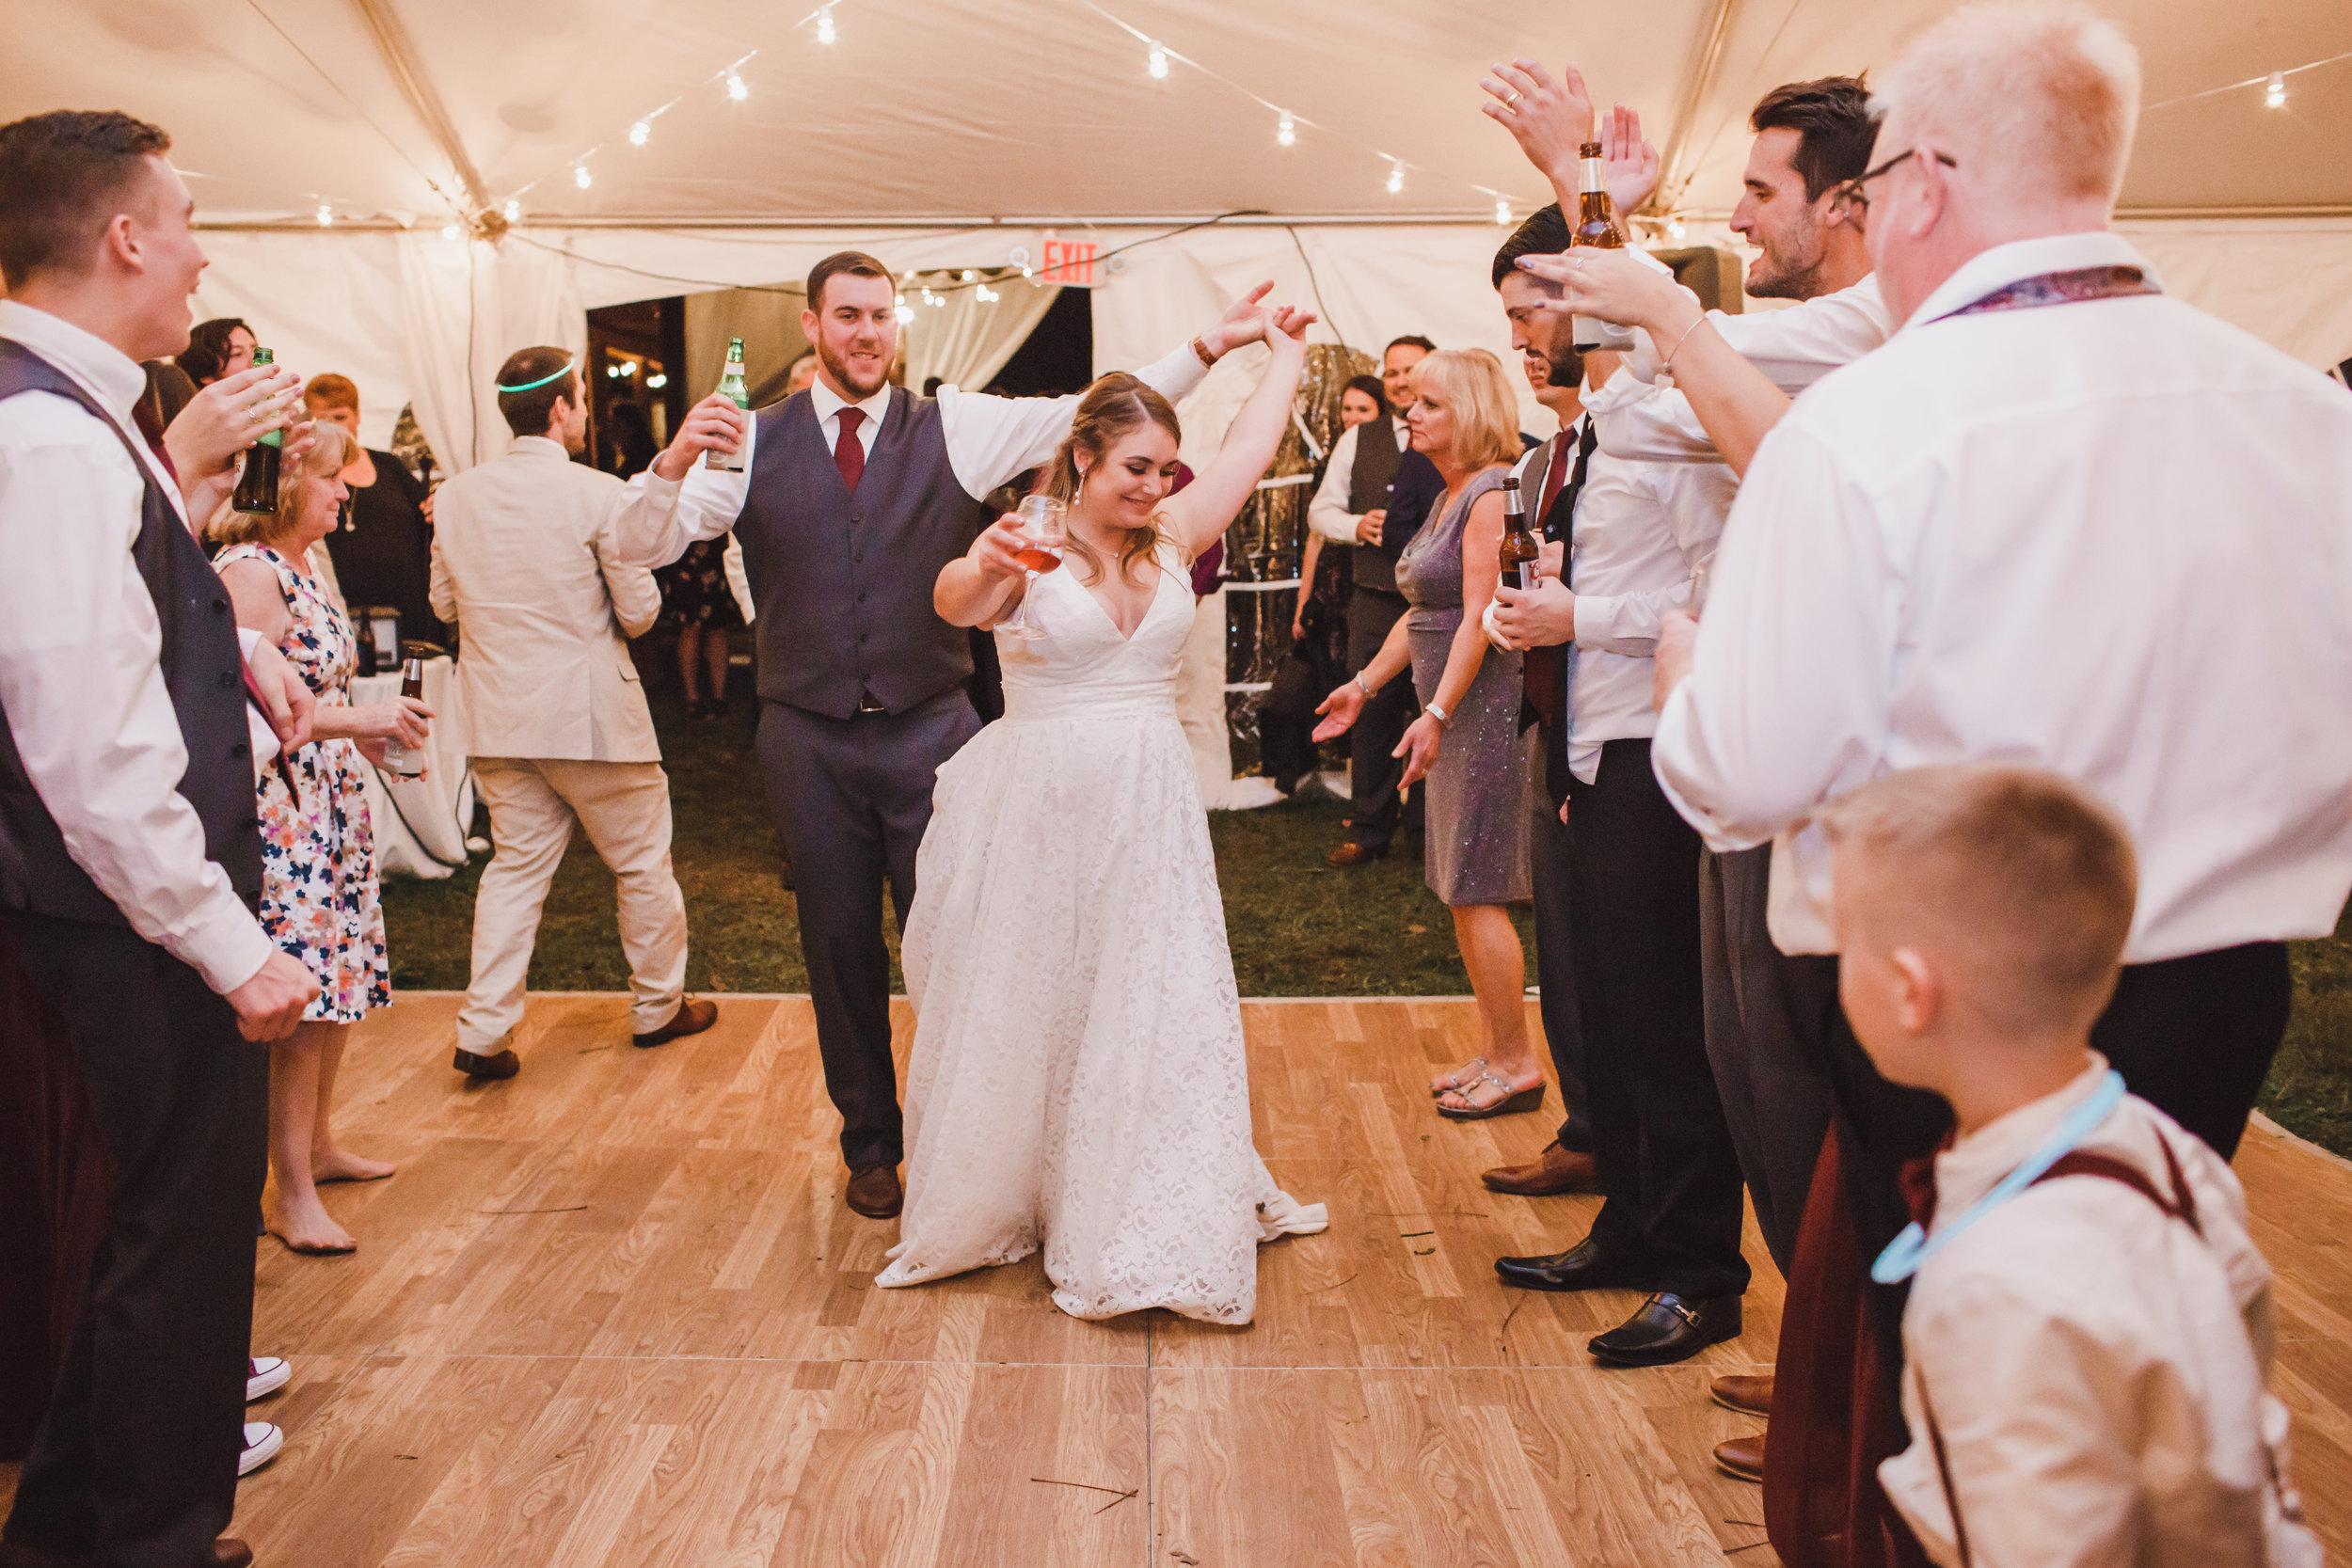 Fling - Virginia Wedding Photographer - Photography by Amy Nicole-1007-7.jpg